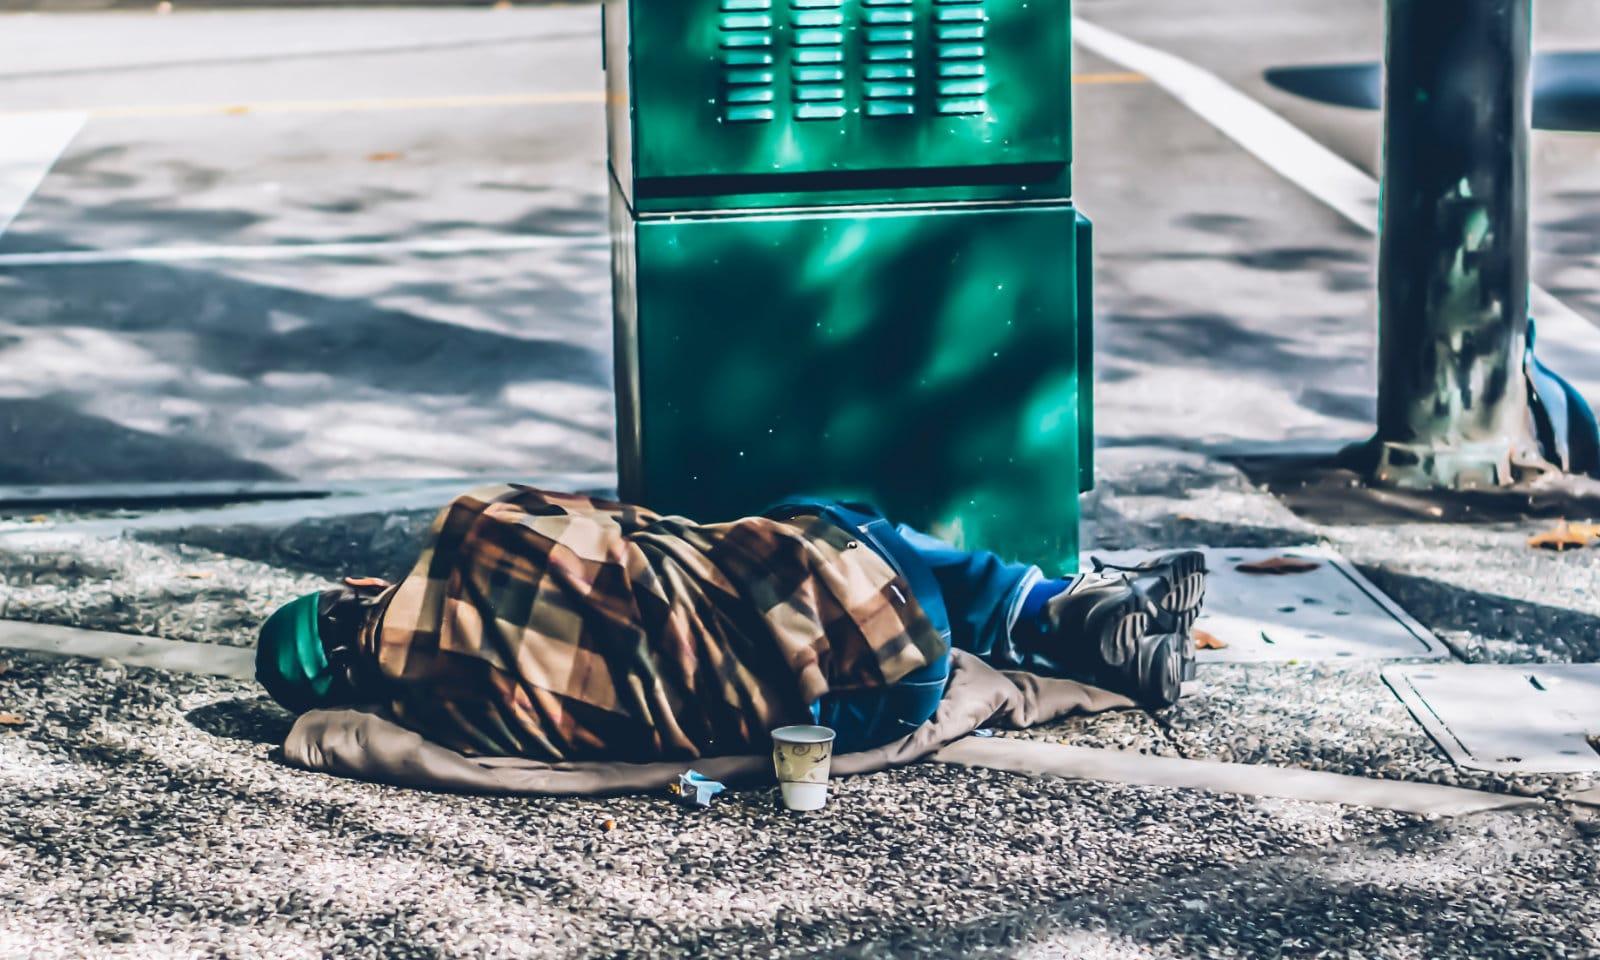 Addressing the Homeless Phenomenon